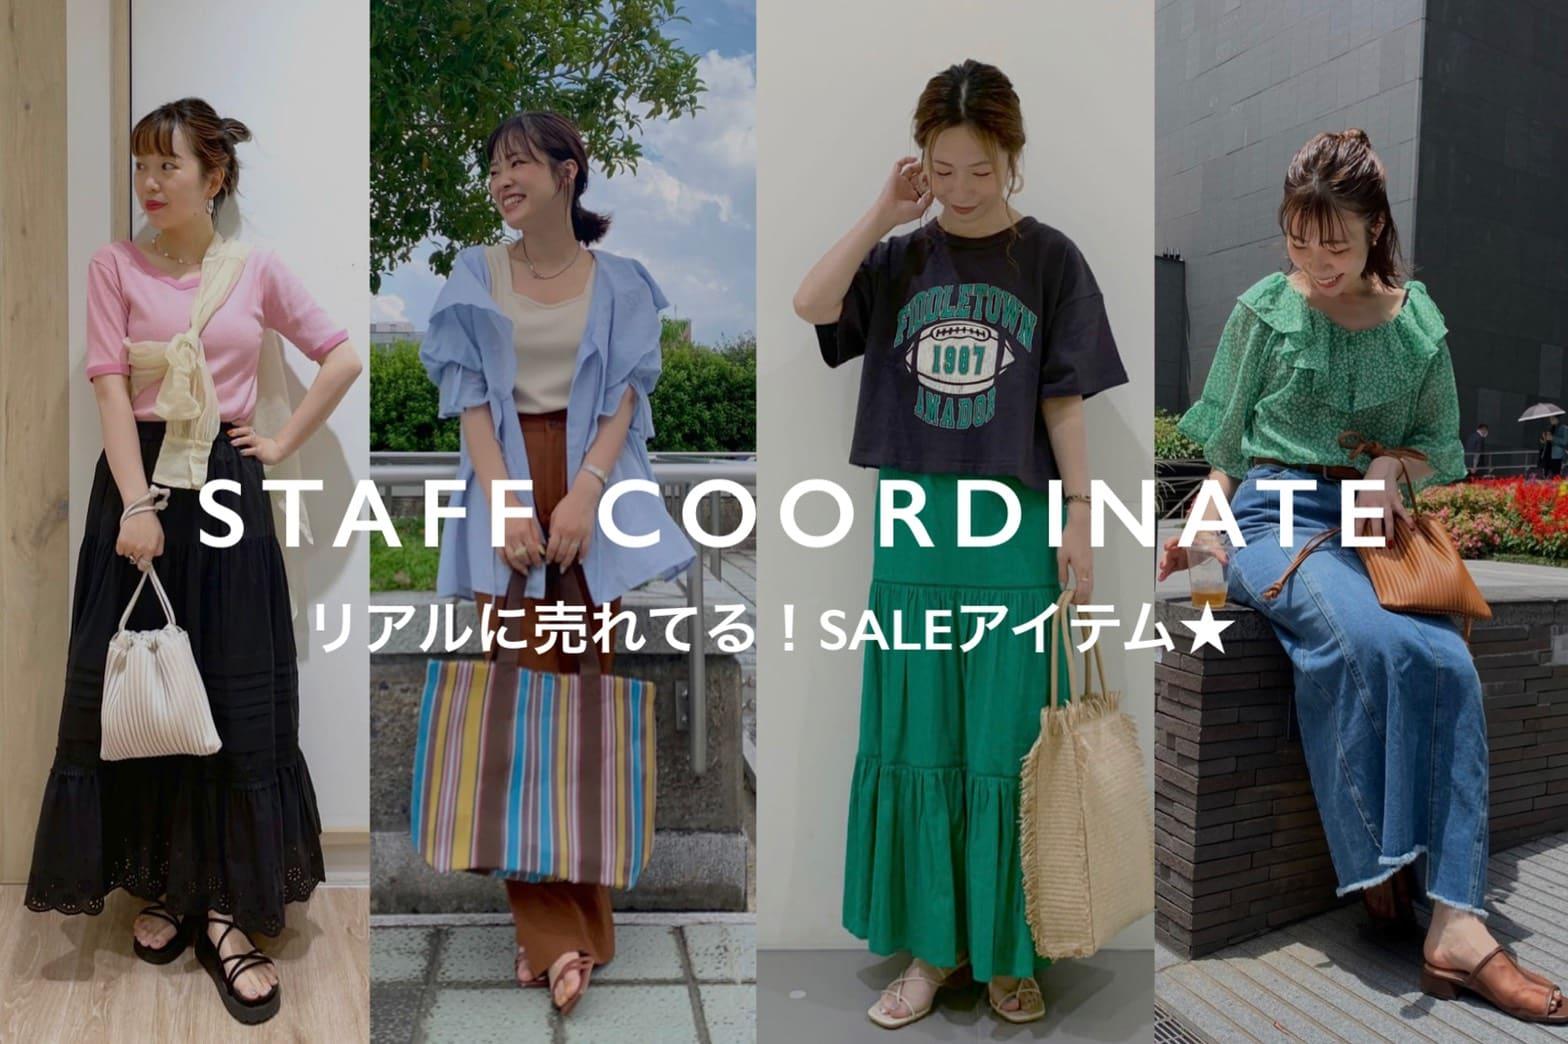 Discoat 【STAFF COORDINATE】リアルに売れてる!SALEアイテム★